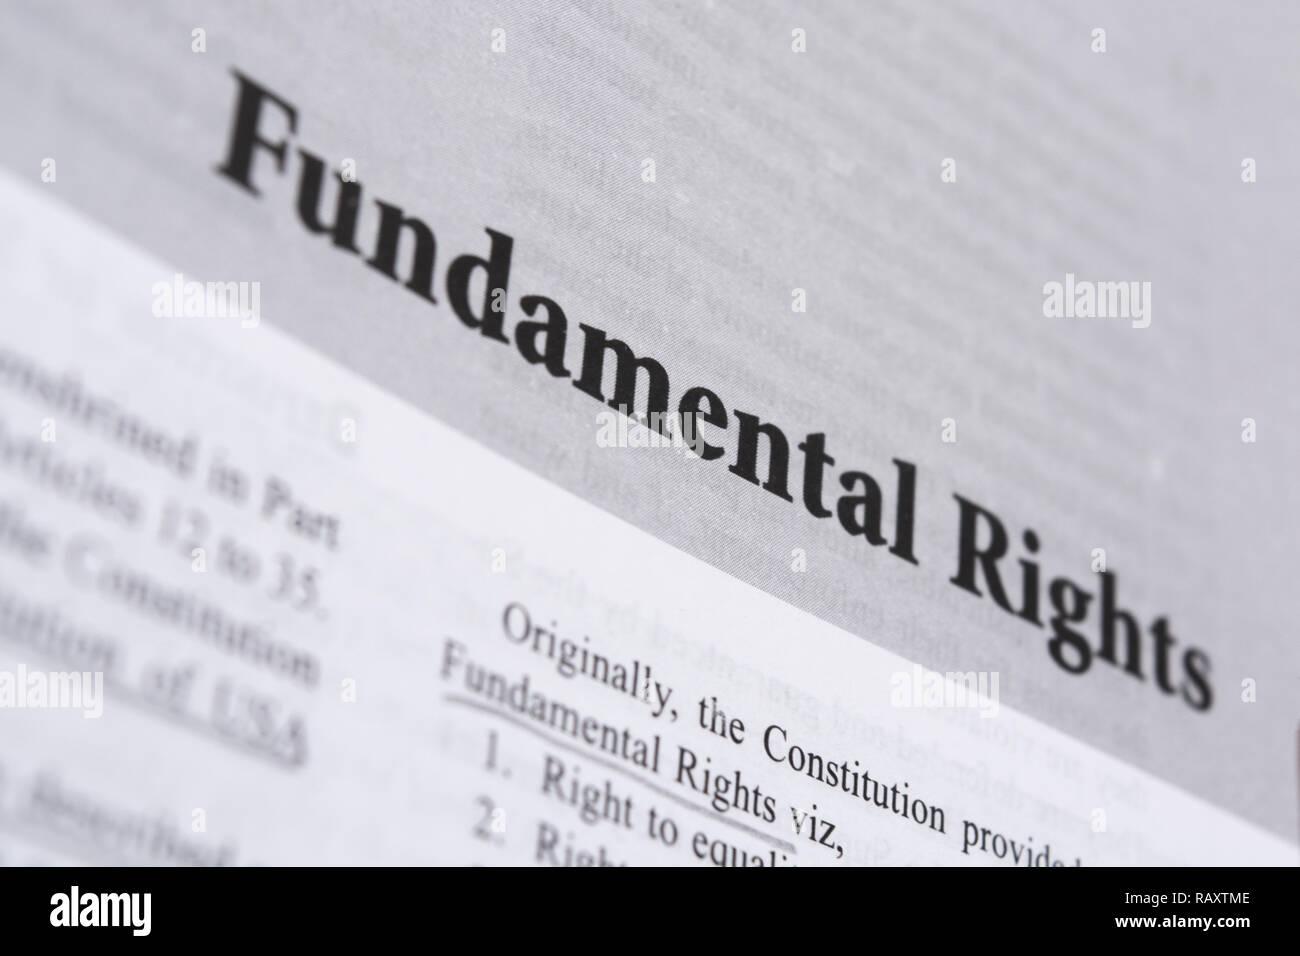 Maski,Karnataka,India - January 4,2019 : Fundamental Rights printed in book with large letters. - Stock Image